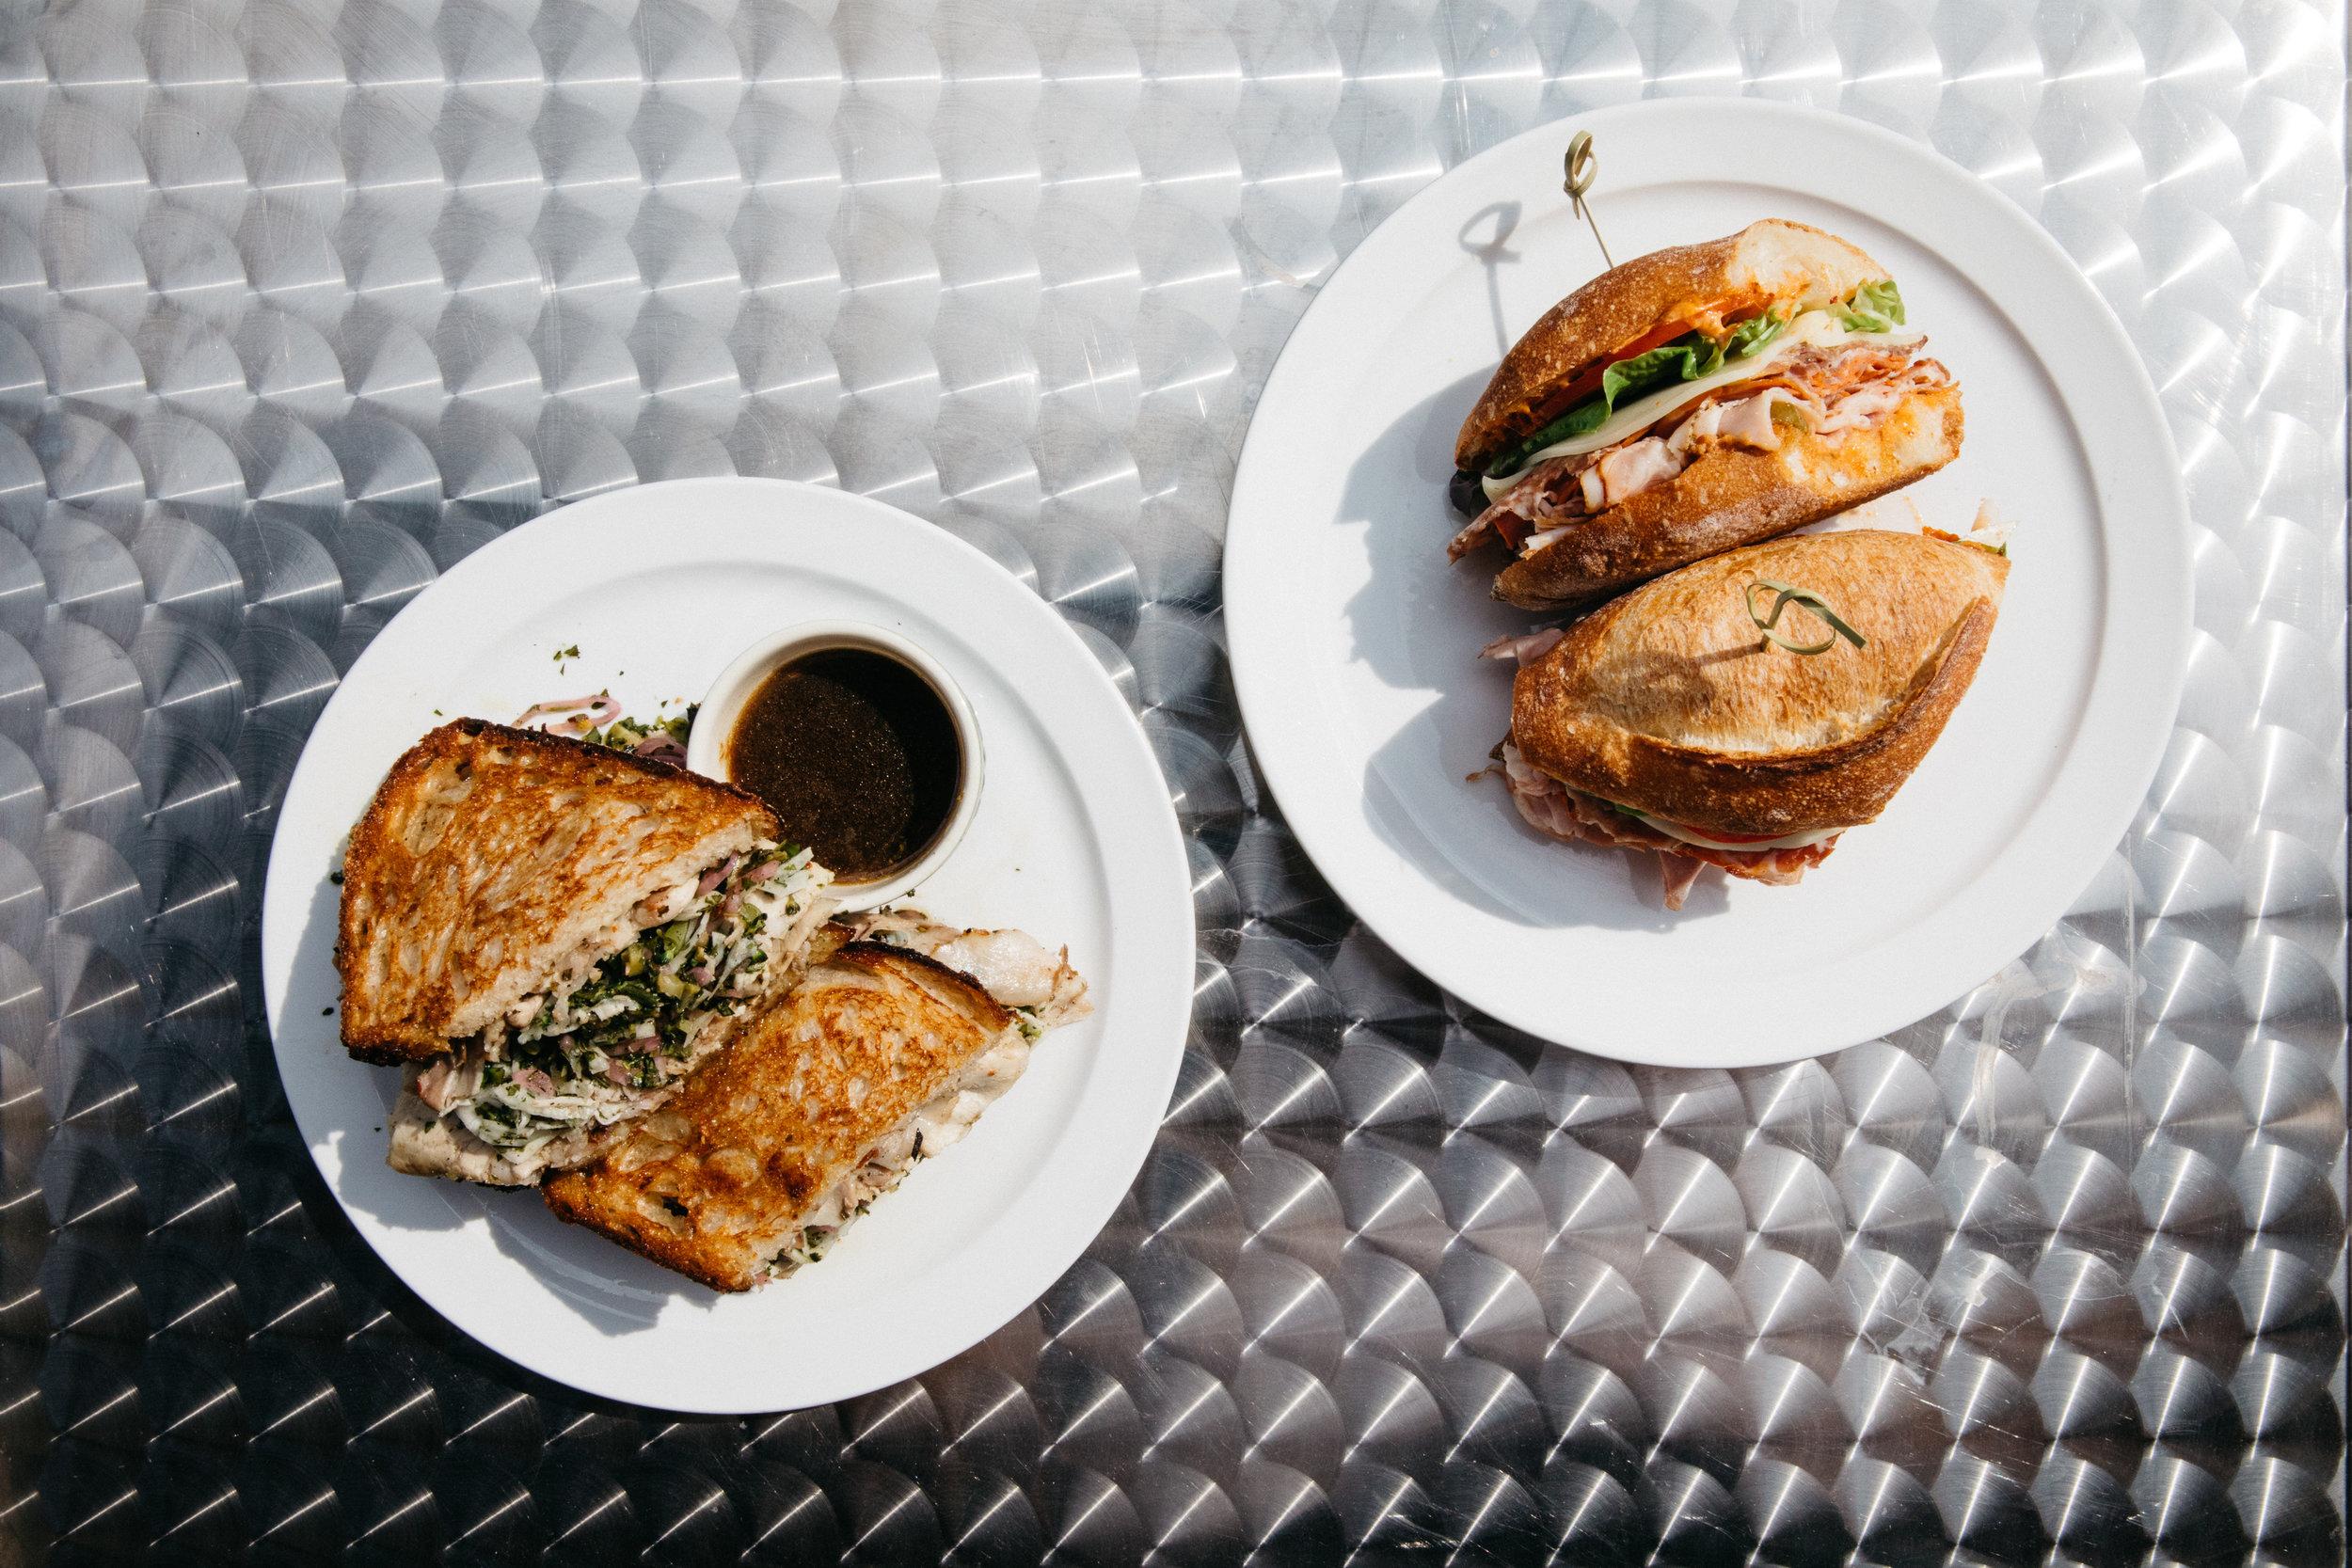 My Favorite Food Photos of 2018